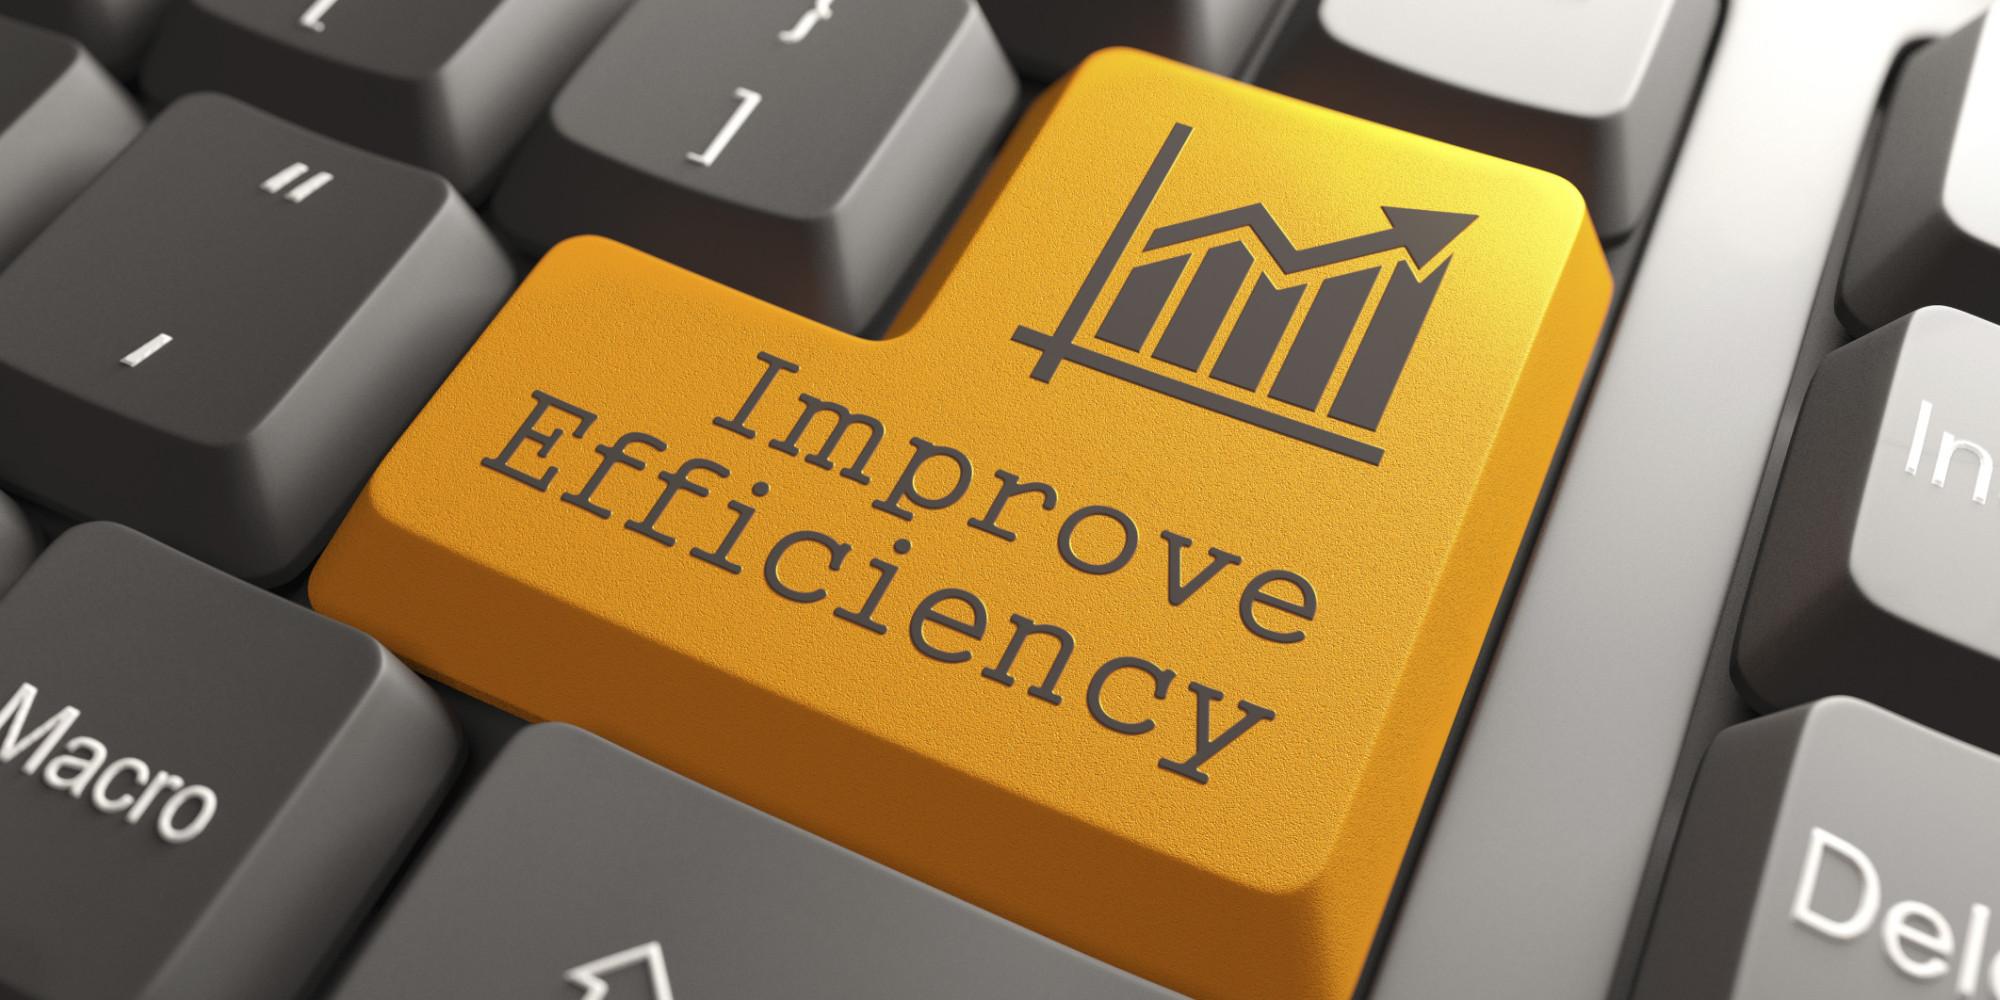 Improve efficiency